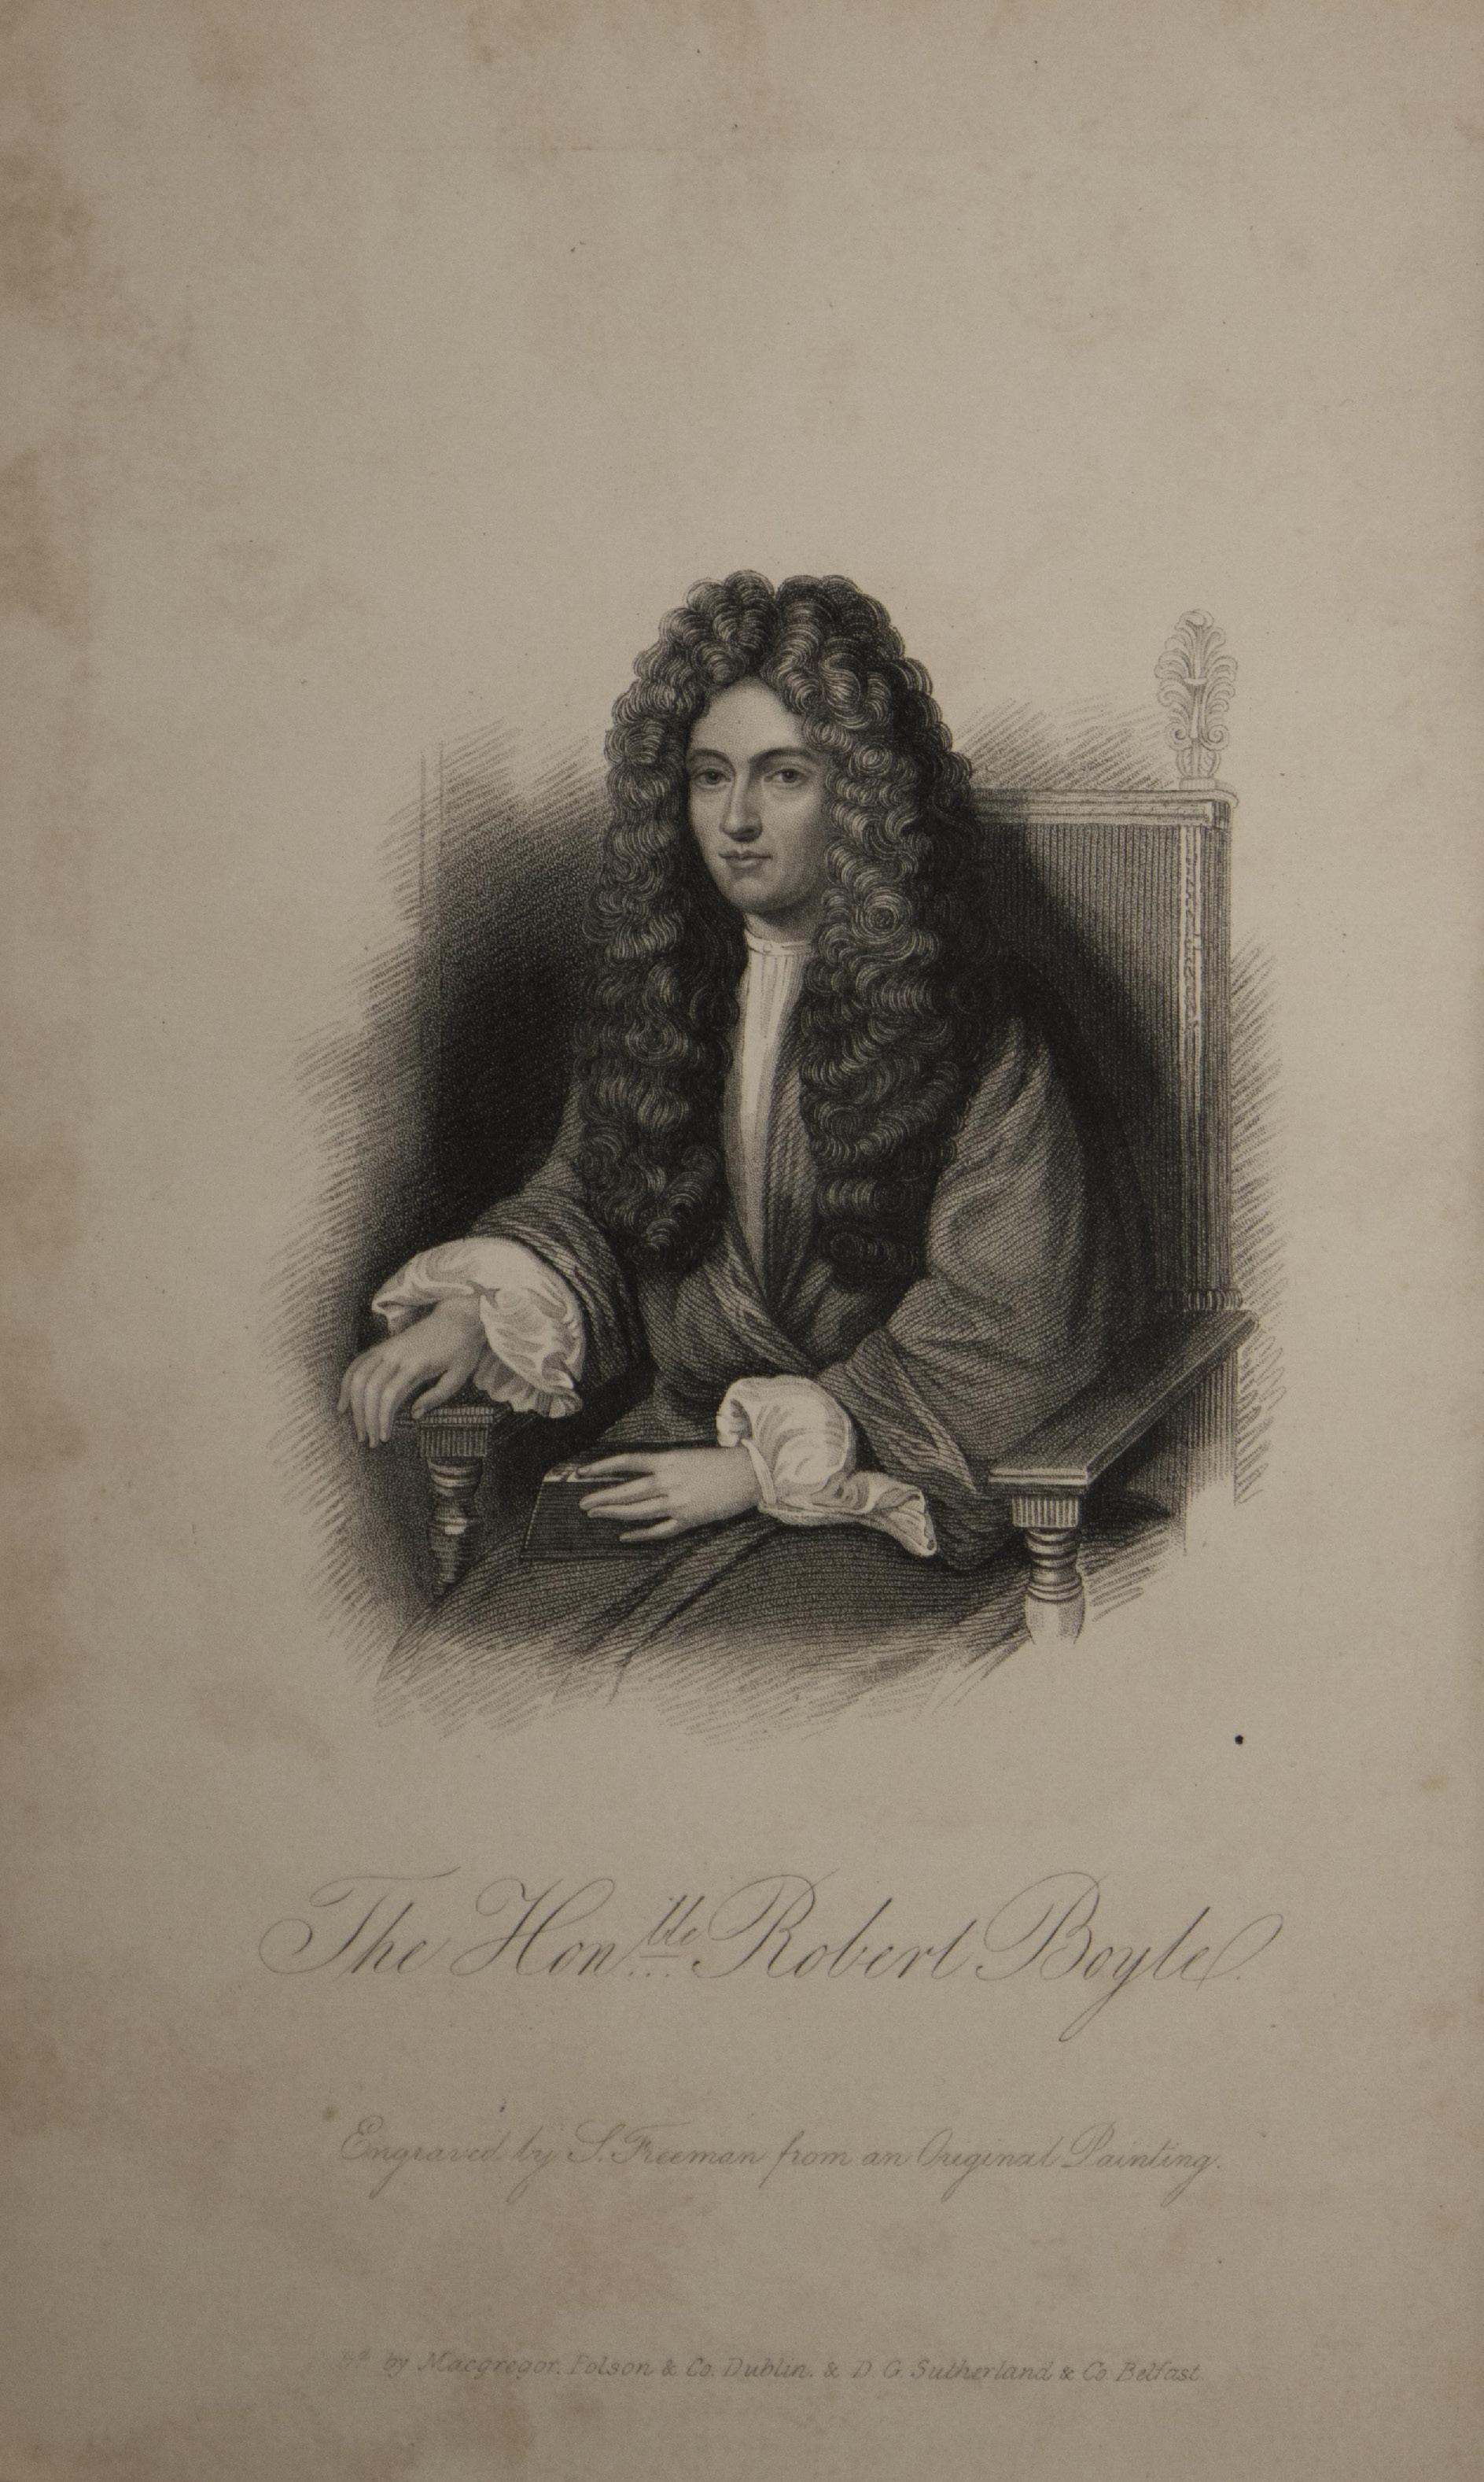 photo of  Lives of Illustrious and Distinguished Irishmen, Vol II Part II, 1840